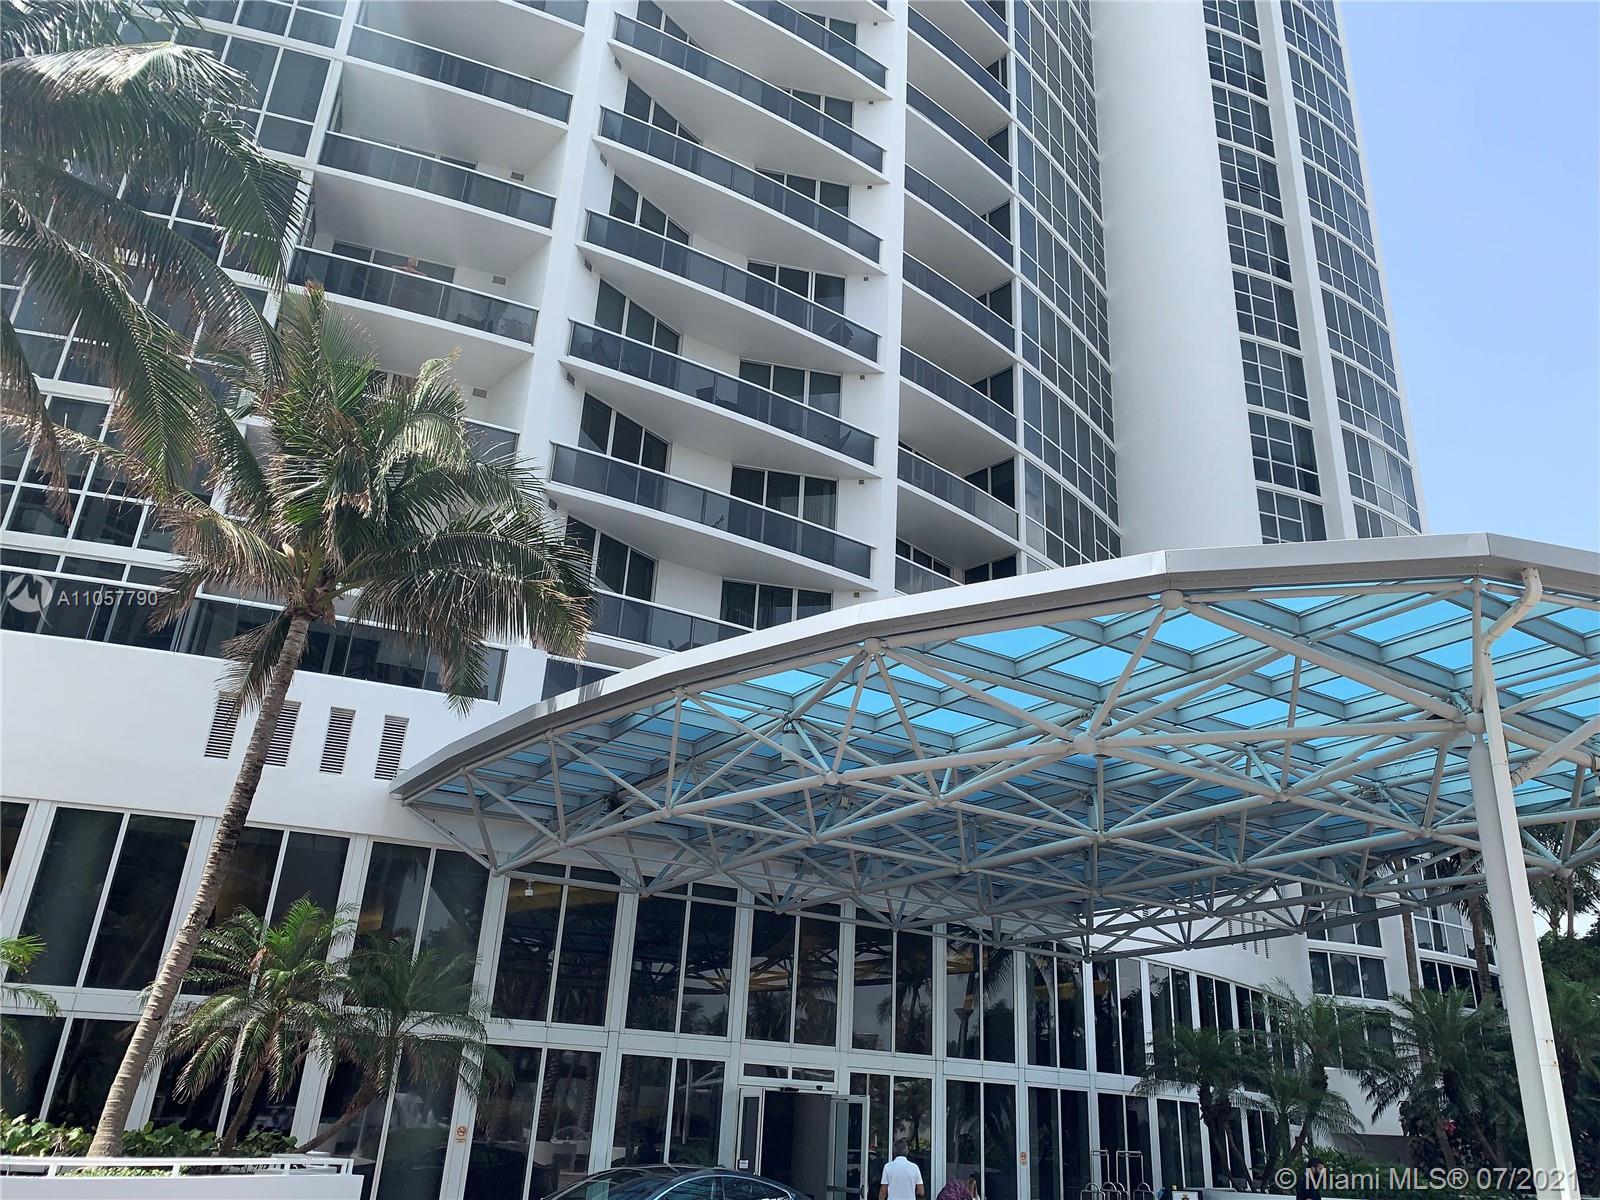 Trump Palace #606 - 18101 Collins Ave #606, Sunny Isles Beach, FL 33160